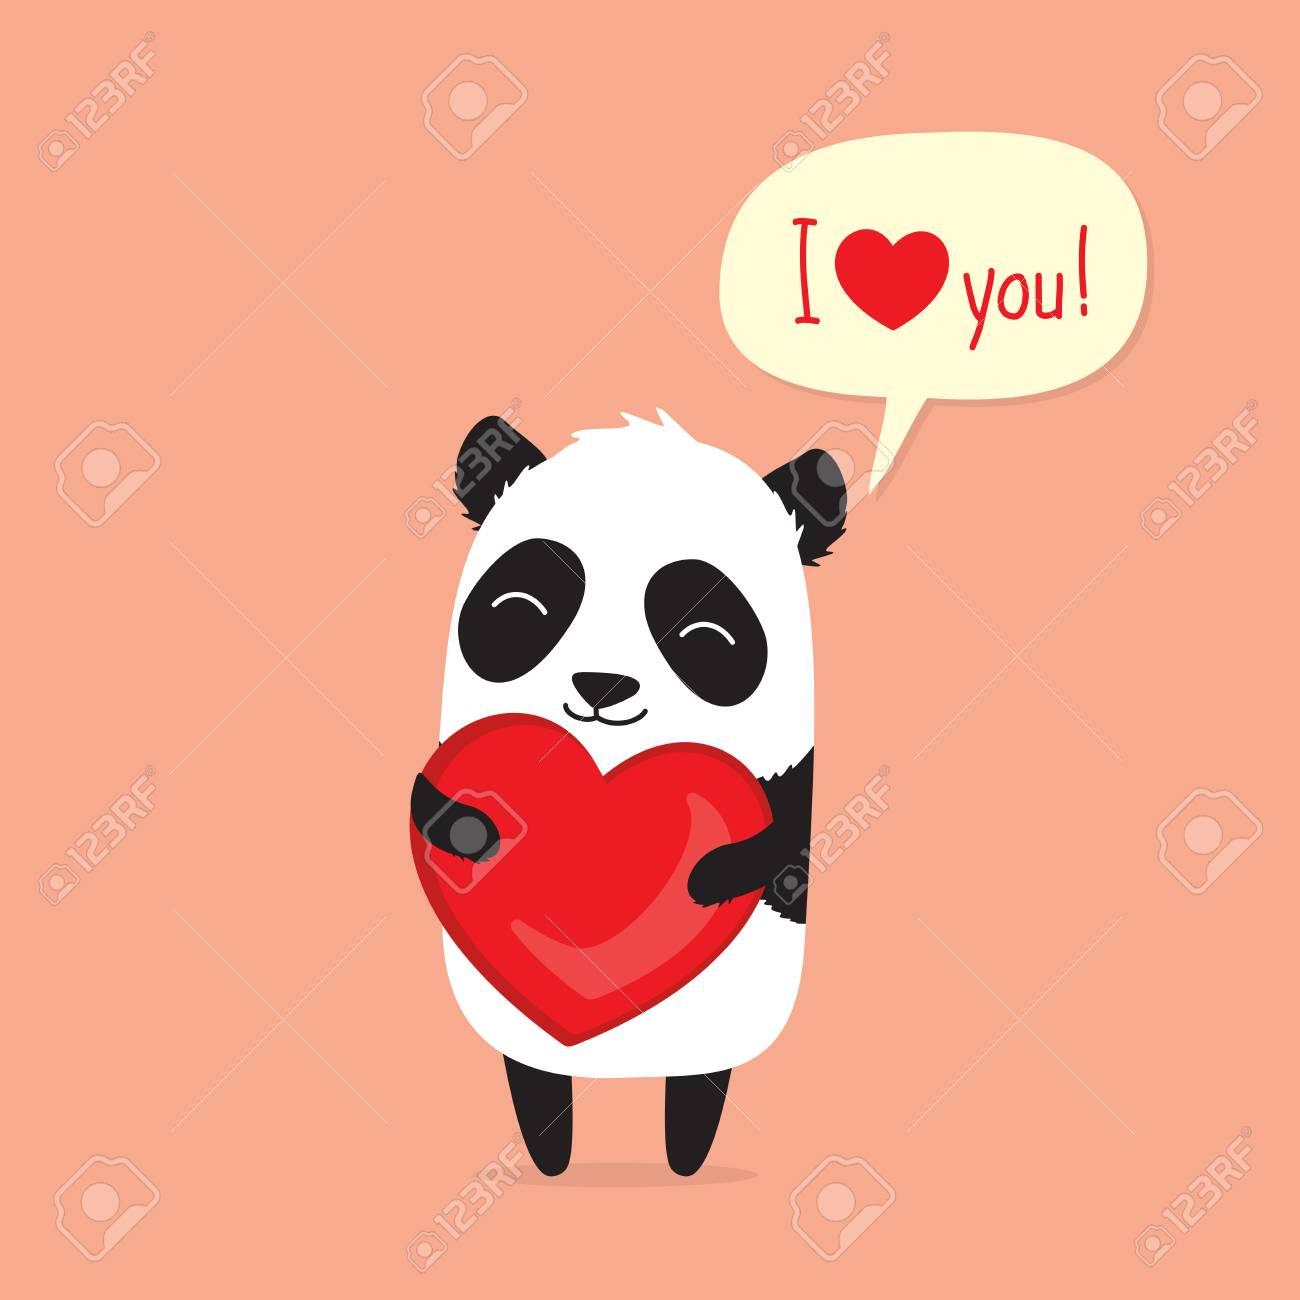 Cute Cartoon Panda Holding Heart And Saying I Love You In Speech